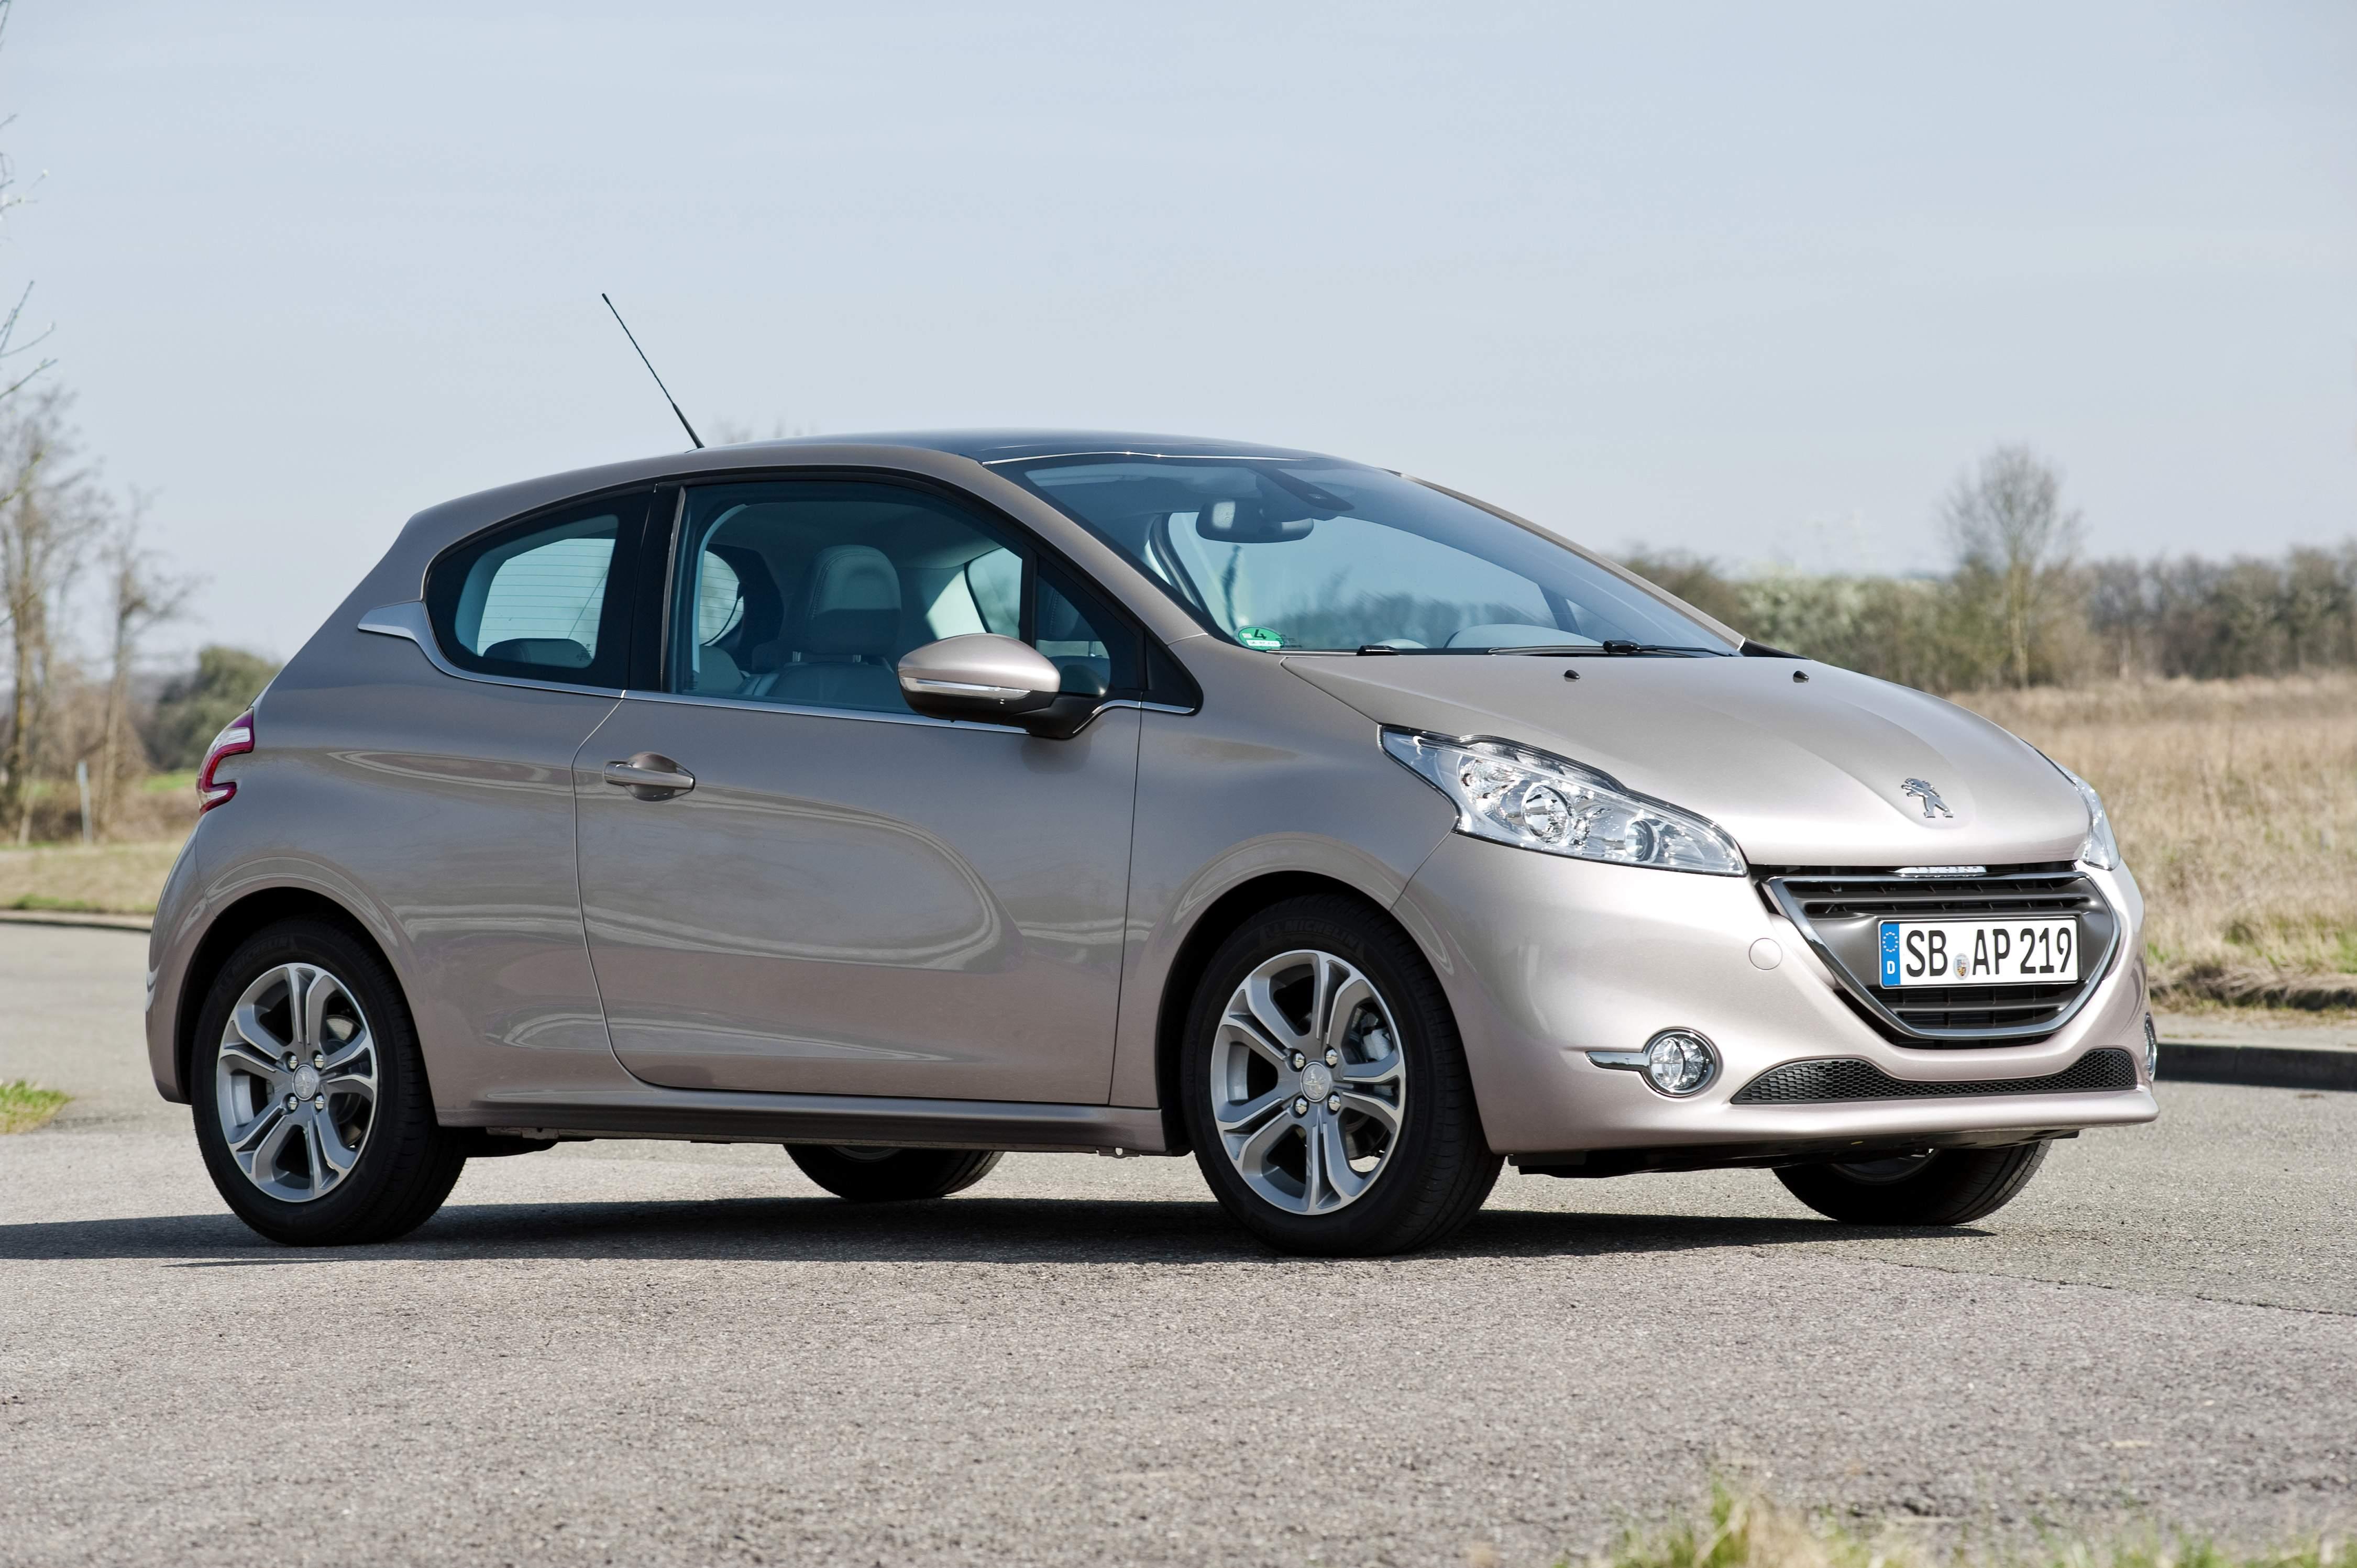 abc markets News 01 Der neue Peugeot 208